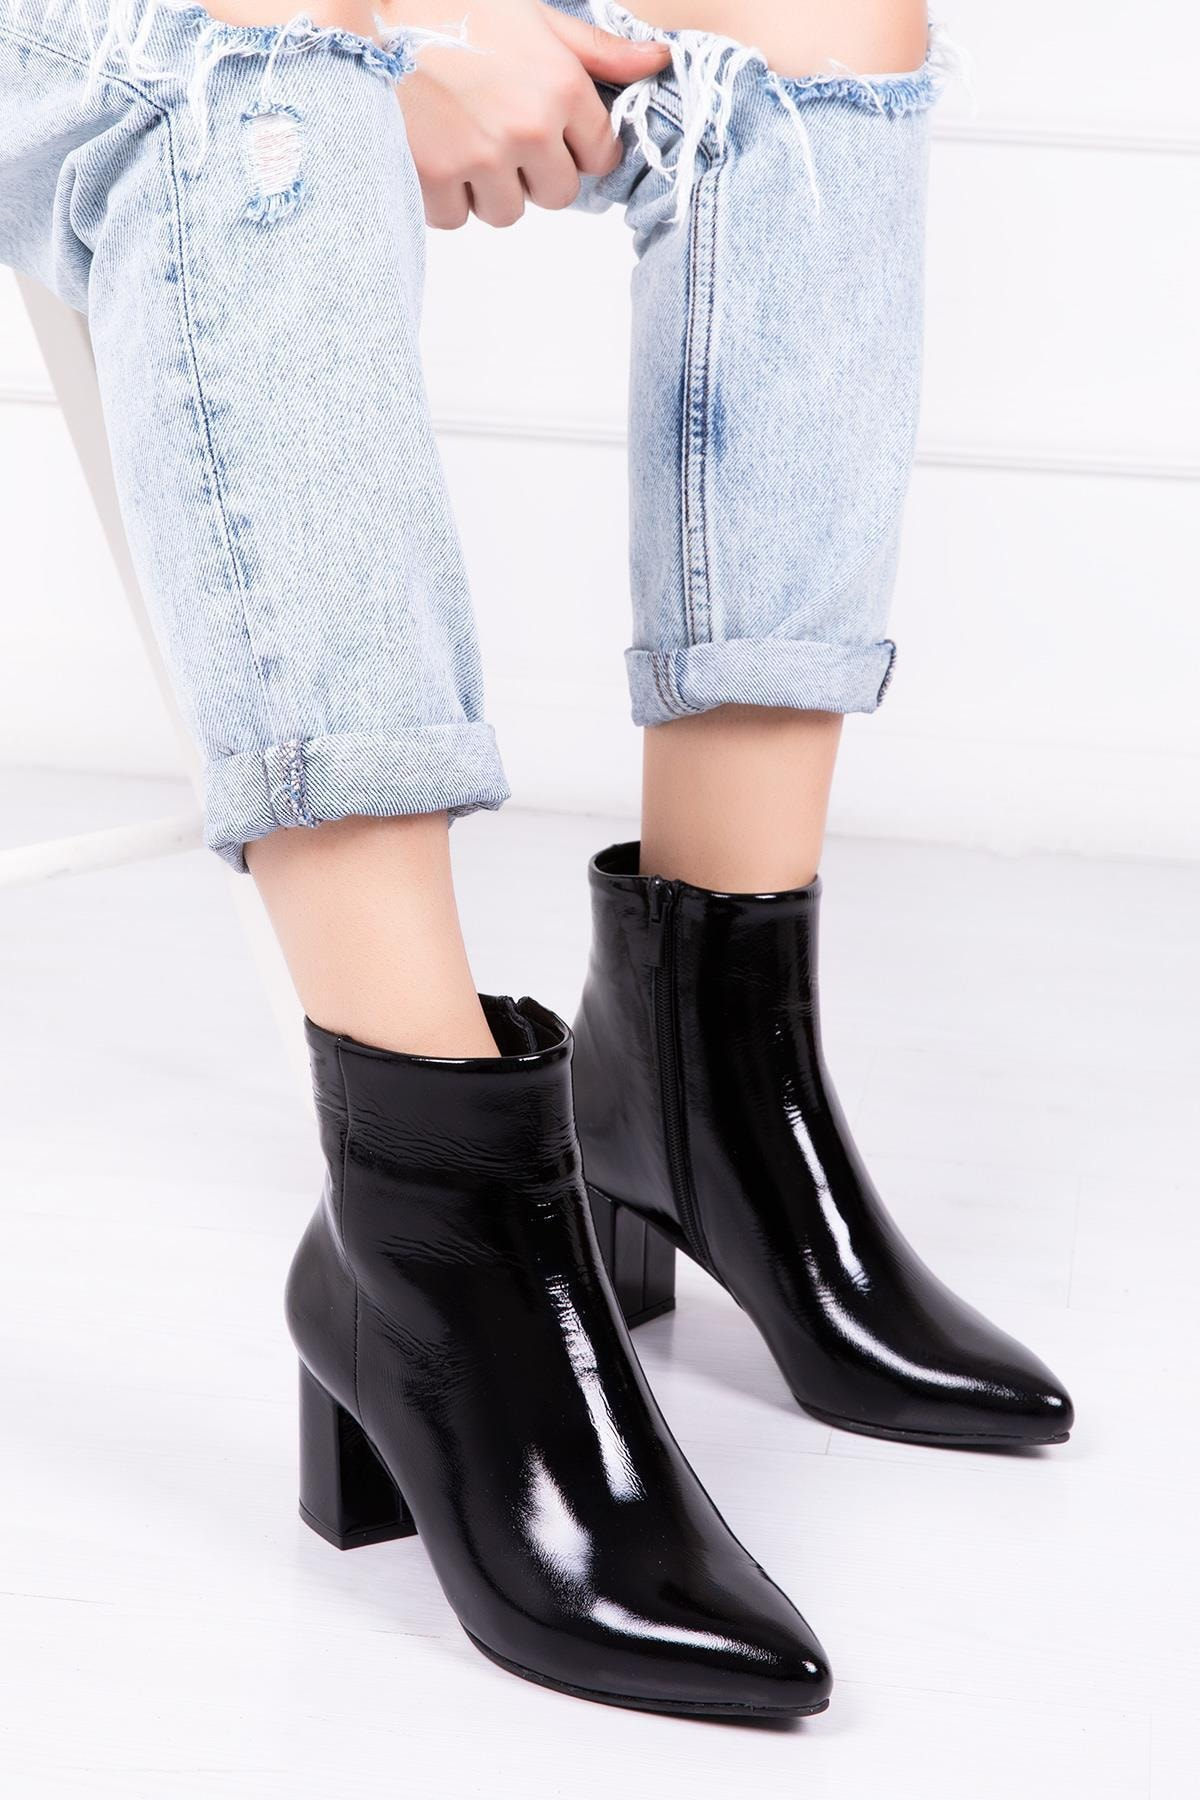 Deripabuc Hakiki Deri Siyah Rugan Kadın Topuklu Deri Bot Dp02-0001 1